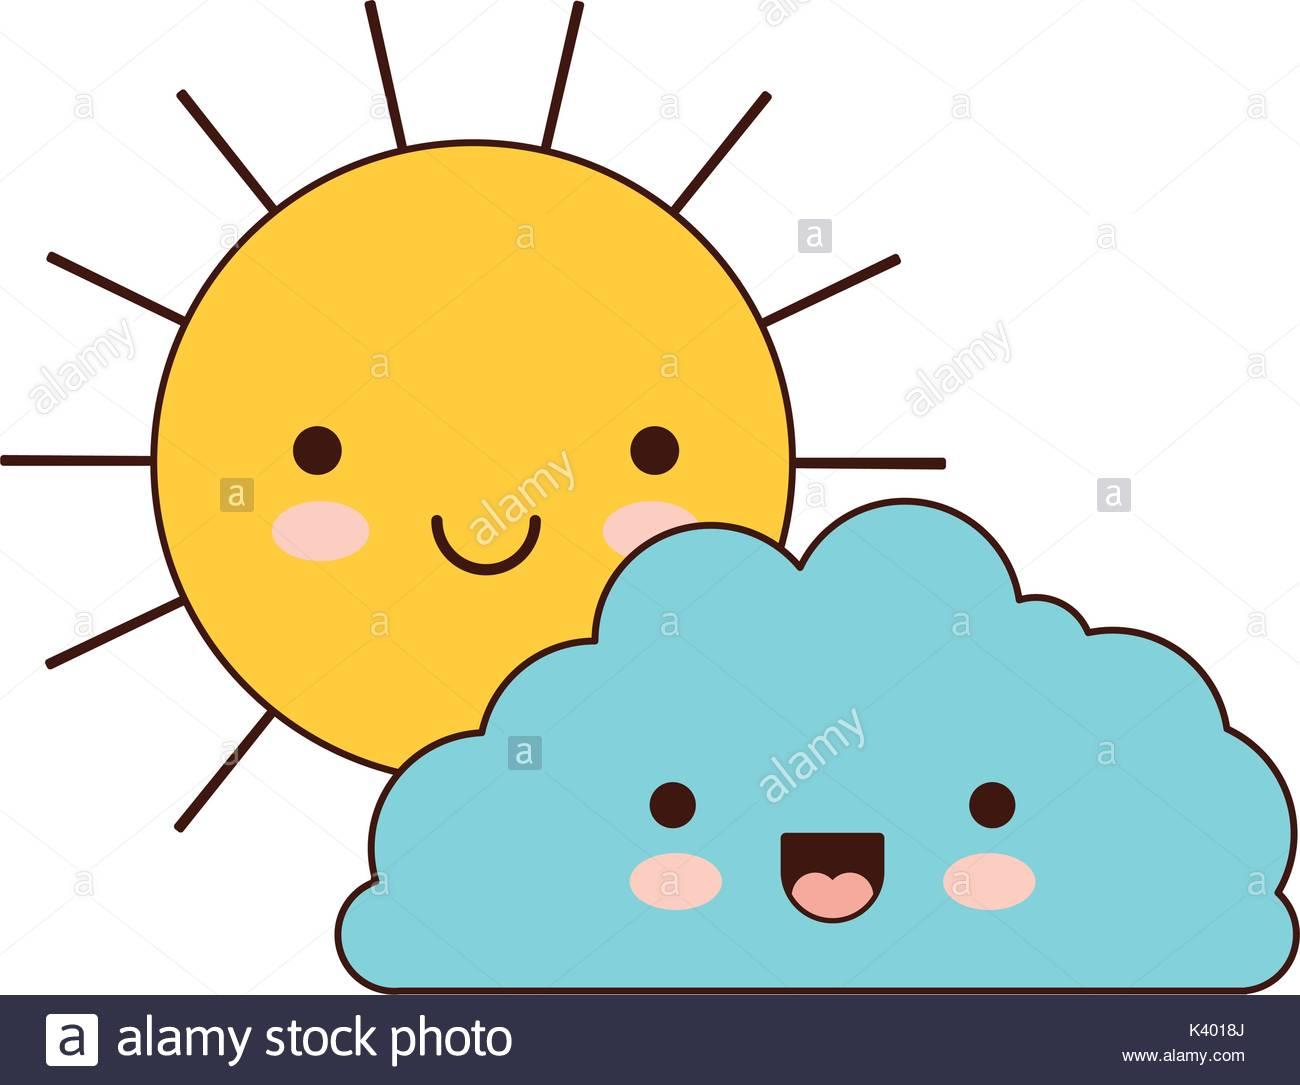 1300x1085 Sun And Cloud Colorful Kawaii Silhouette Stock Vector Art